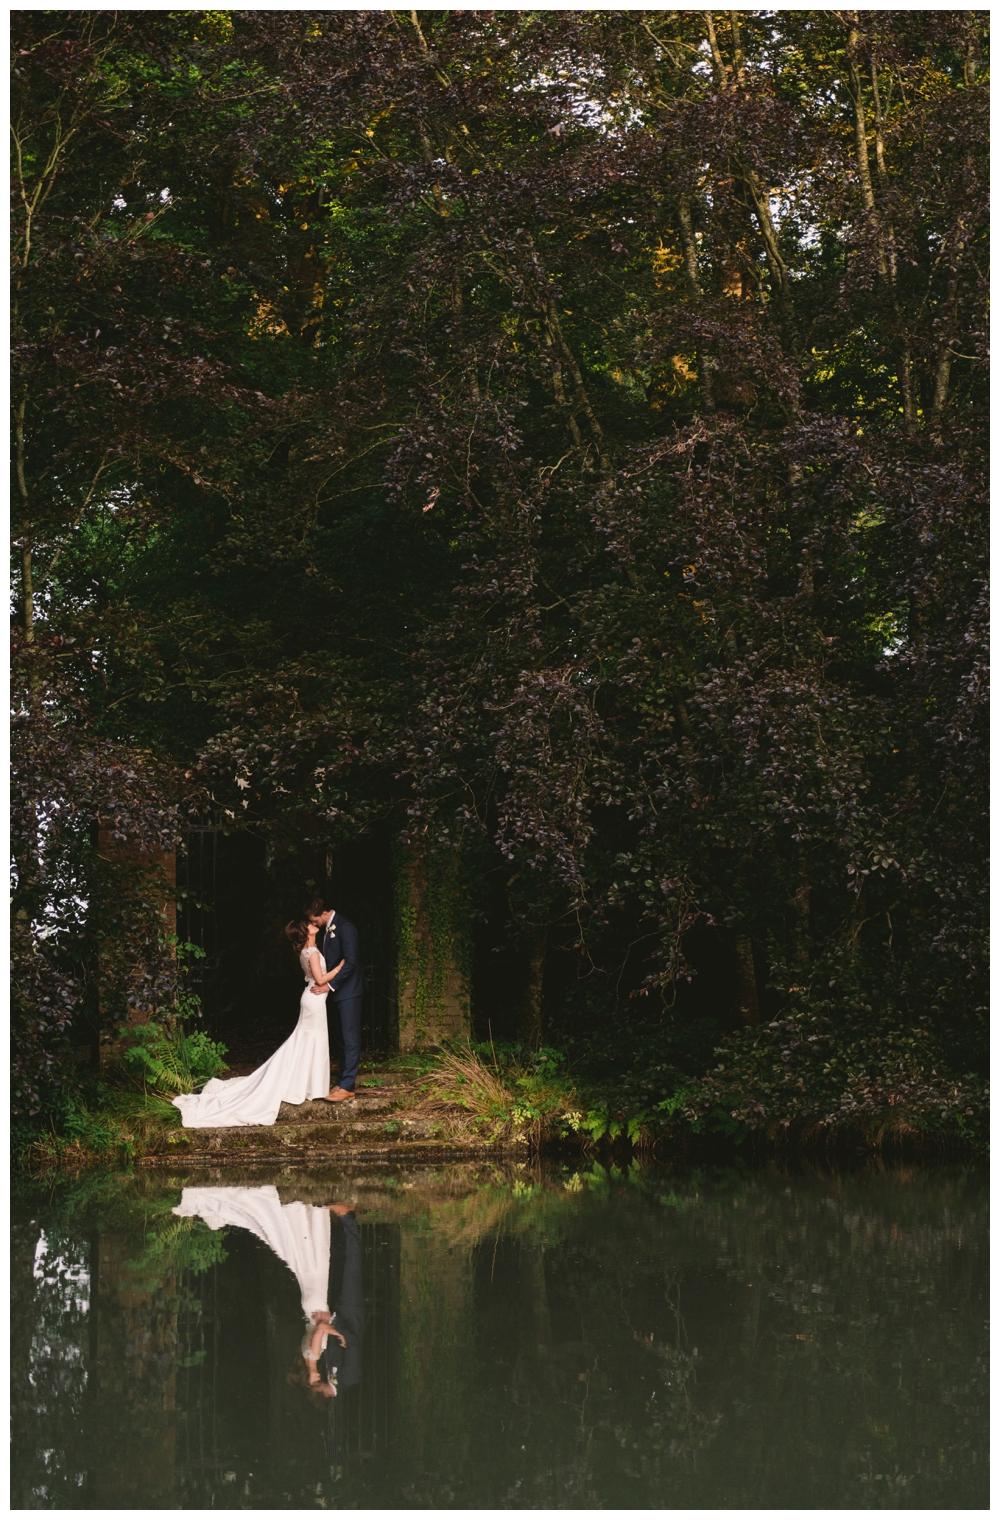 wedding_photographer_northern_ireland_blog_0170.jpg